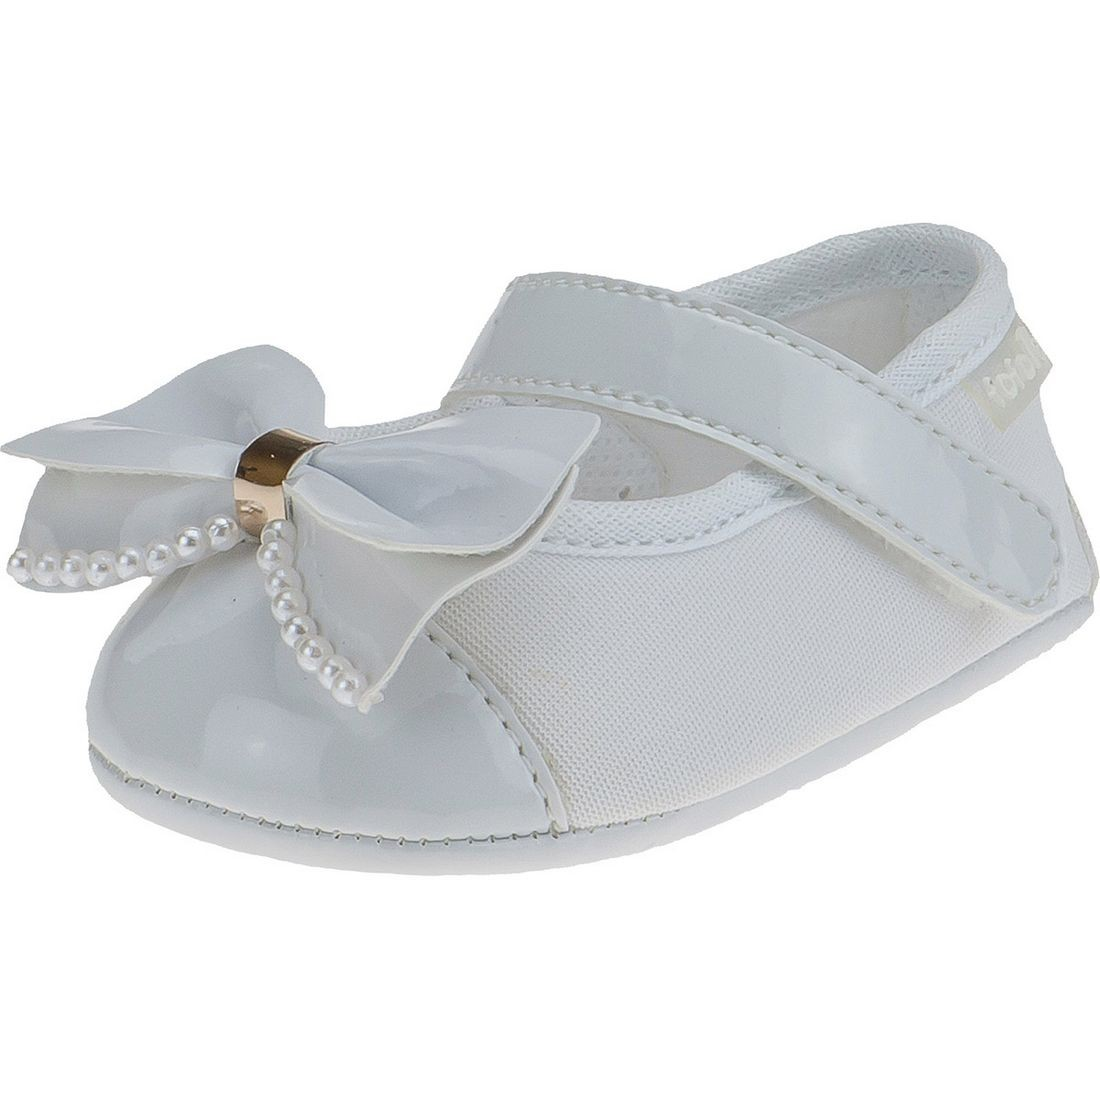 Sapato Boneca Fofopé Laço Sintético